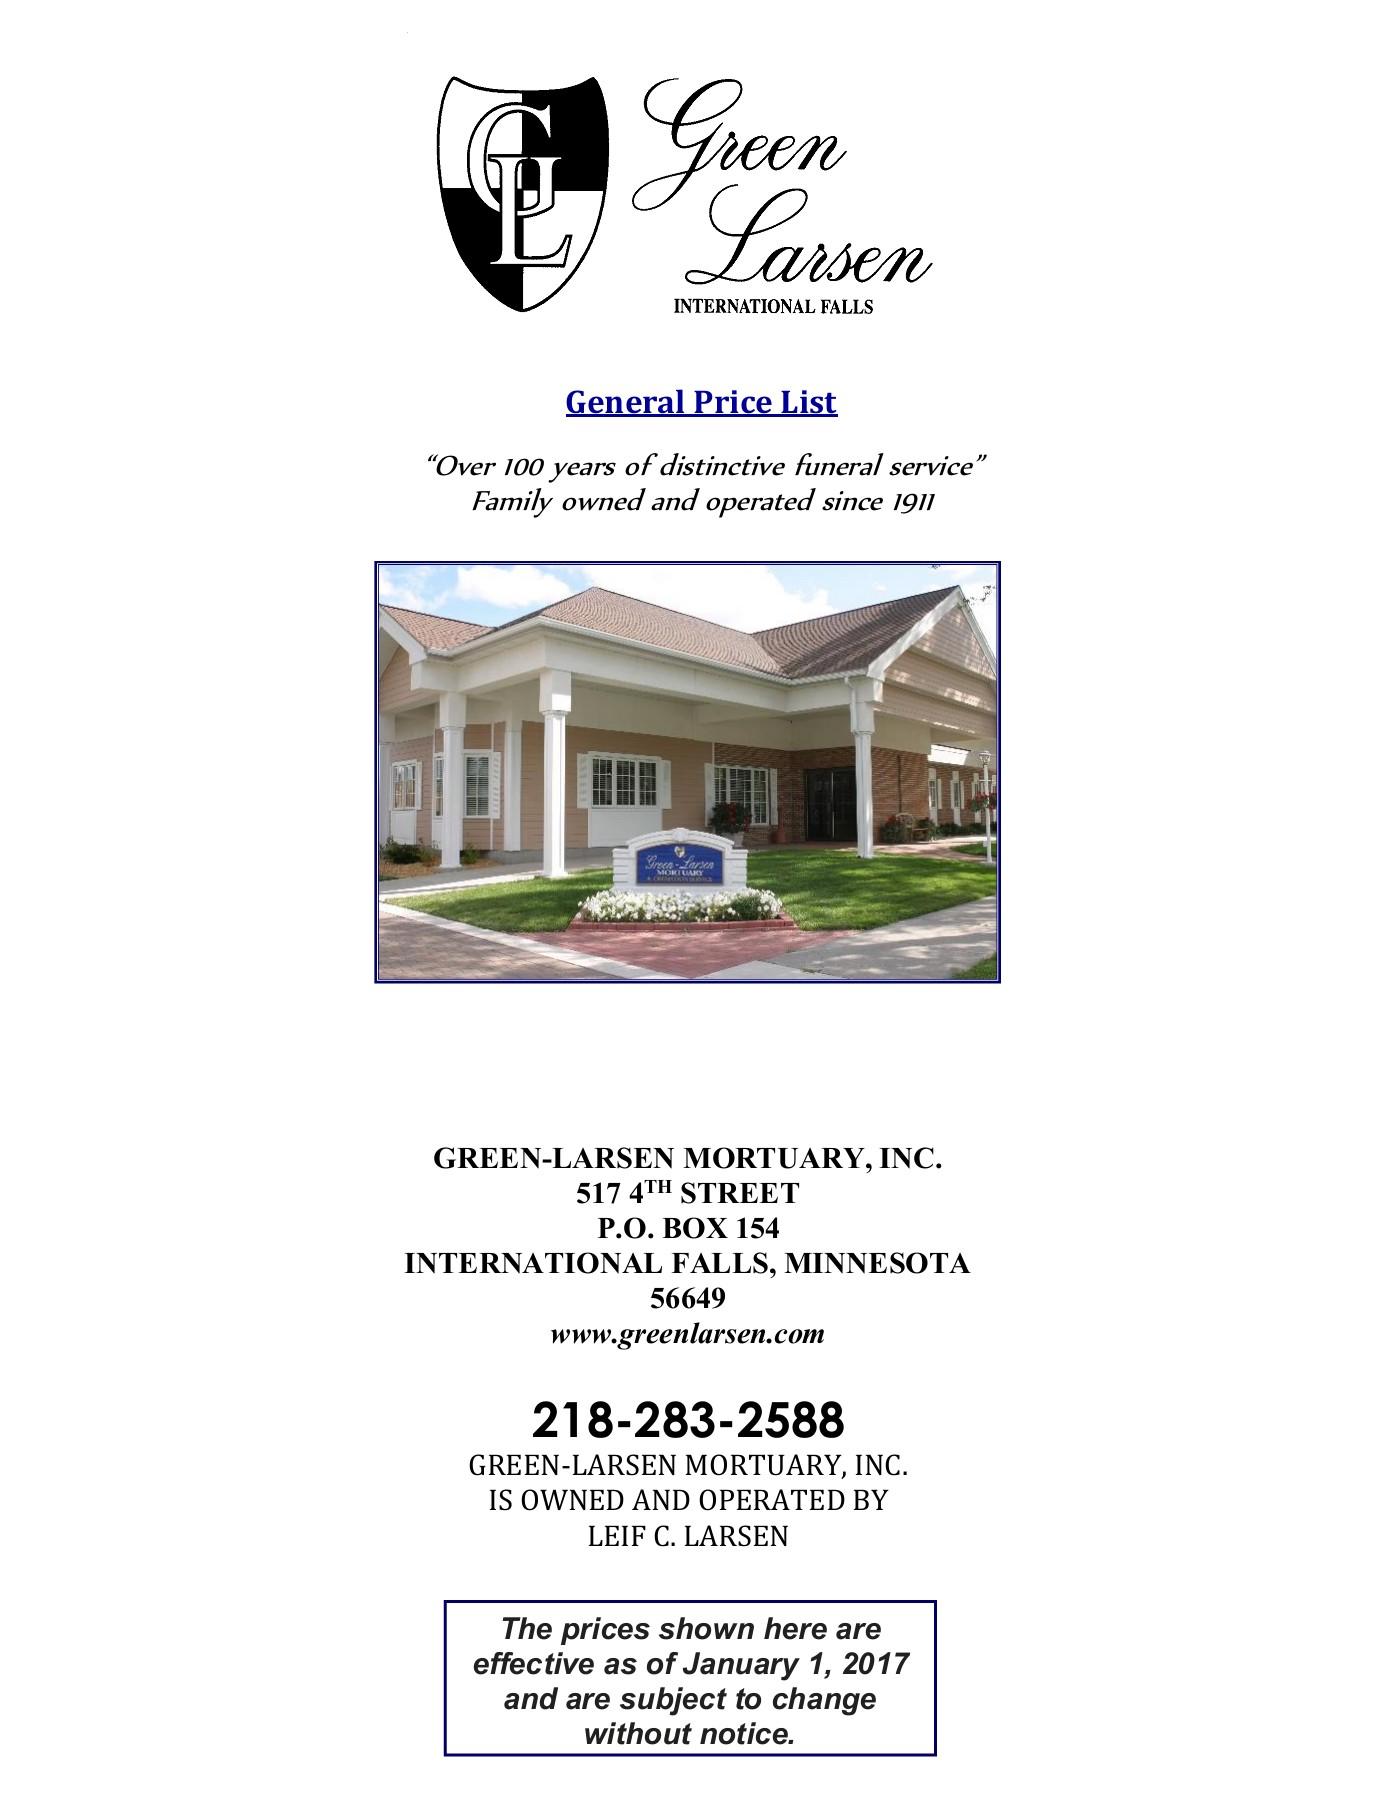 Pricing | Green-Larsen Mortuary, Inc - International Falls, MN